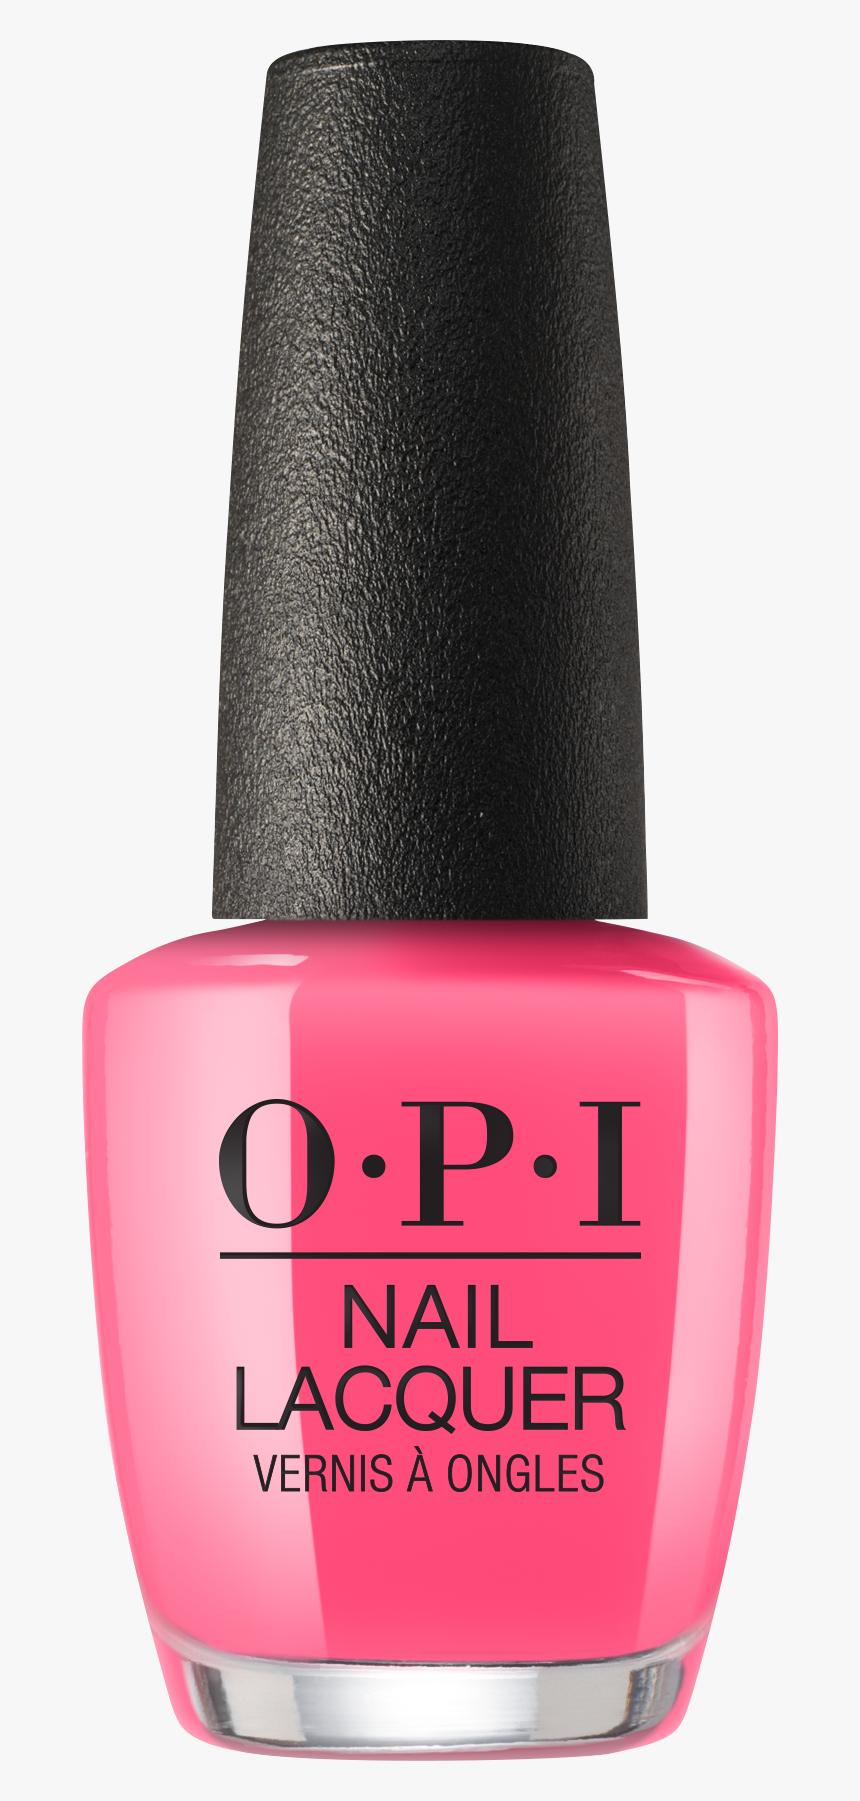 Cute Nail Polish Png, Transparent Png, Free Download